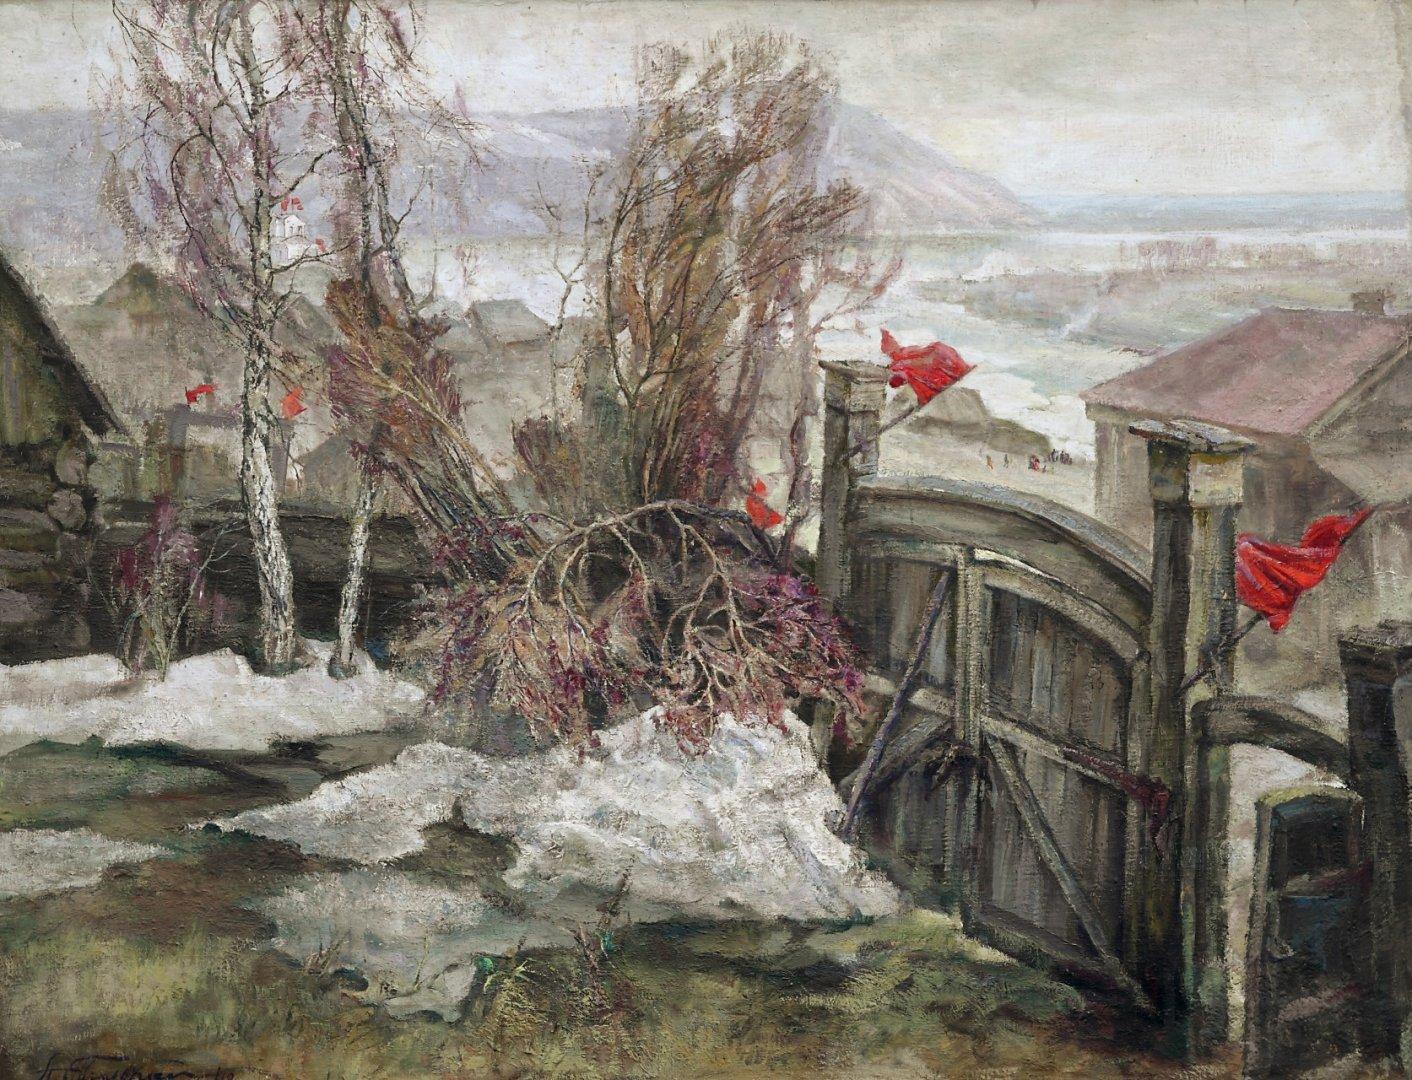 «Праздник на окраине», Александр Тюлькин (1888-1980), 1948, холст, темпера, 100х128